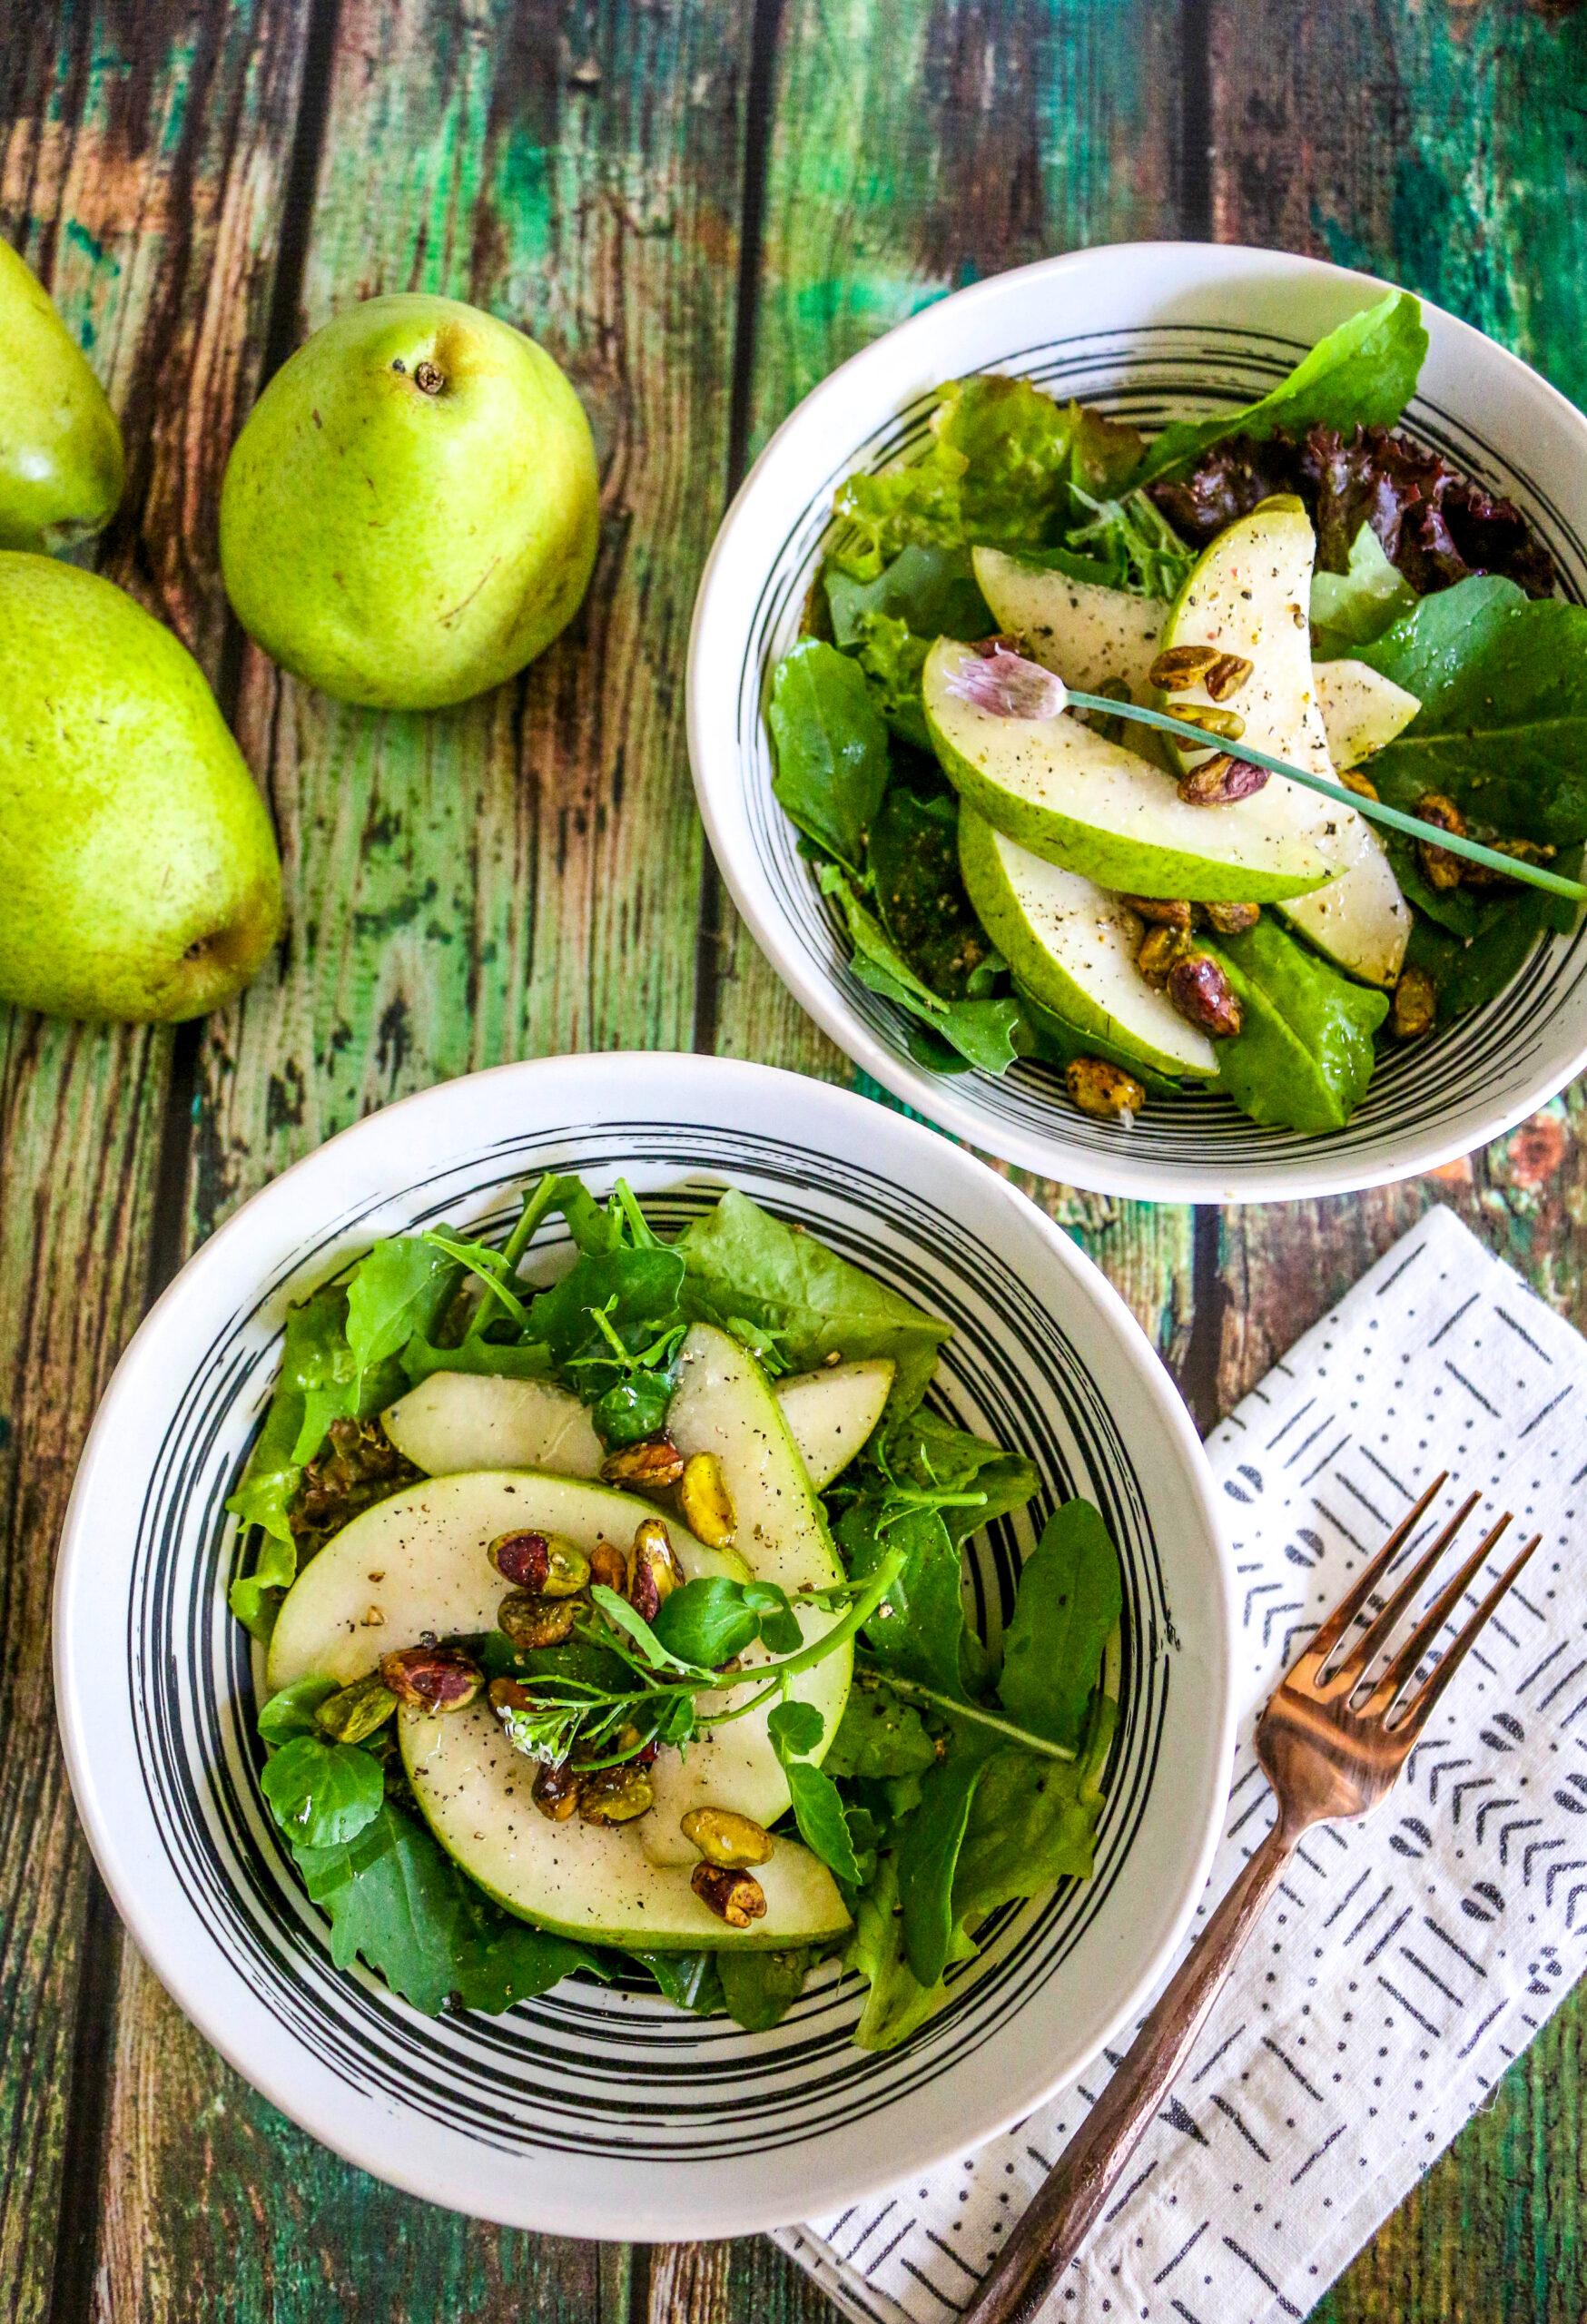 Jade Pear Pistachio Salad